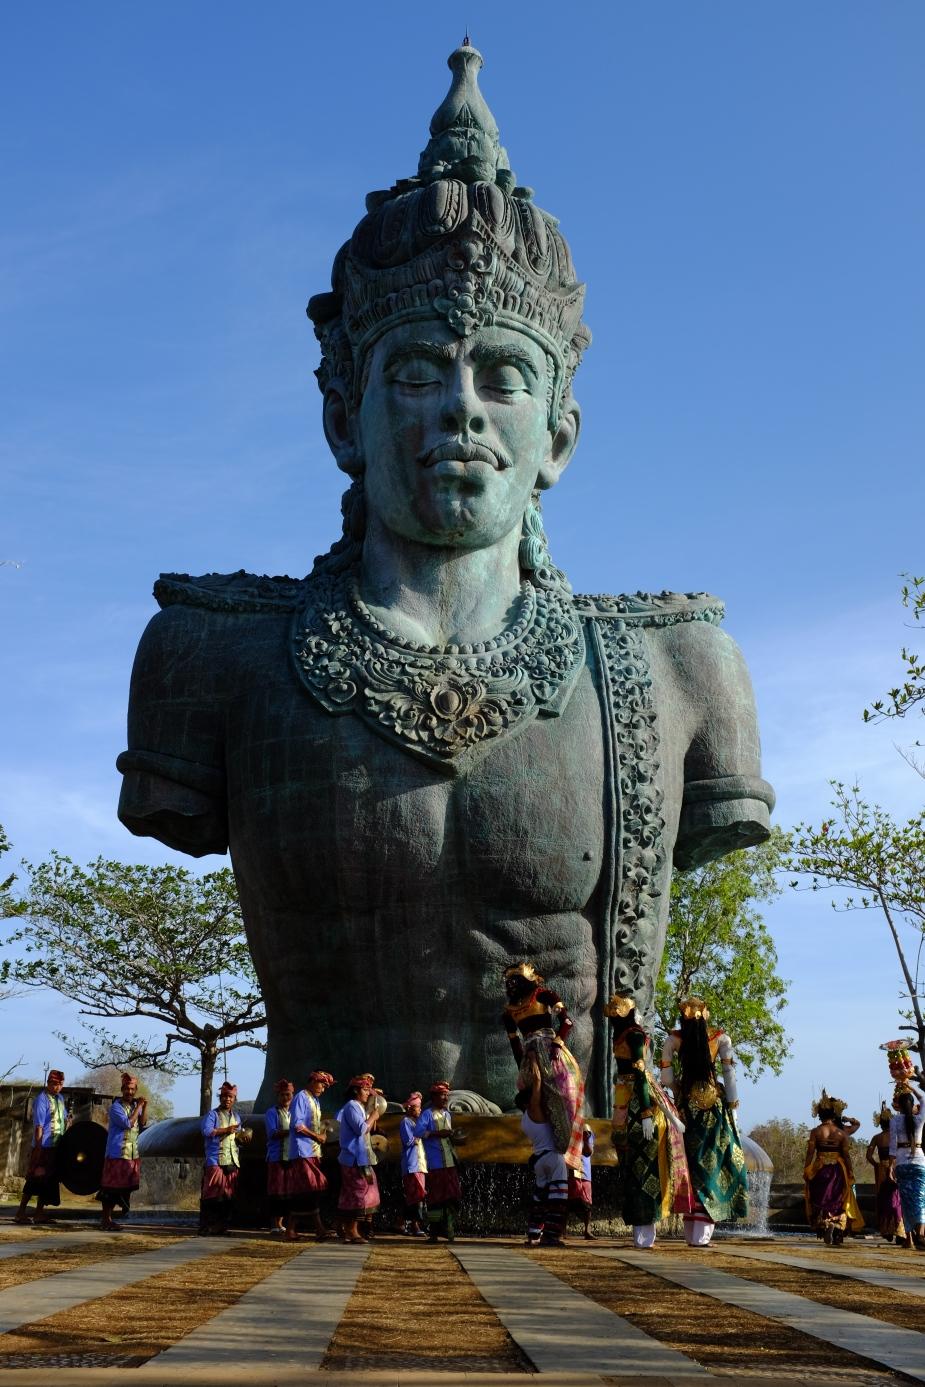 Patung Wisnu, GWK, Bali. Speed 1/140, F/11.0 ISO 200